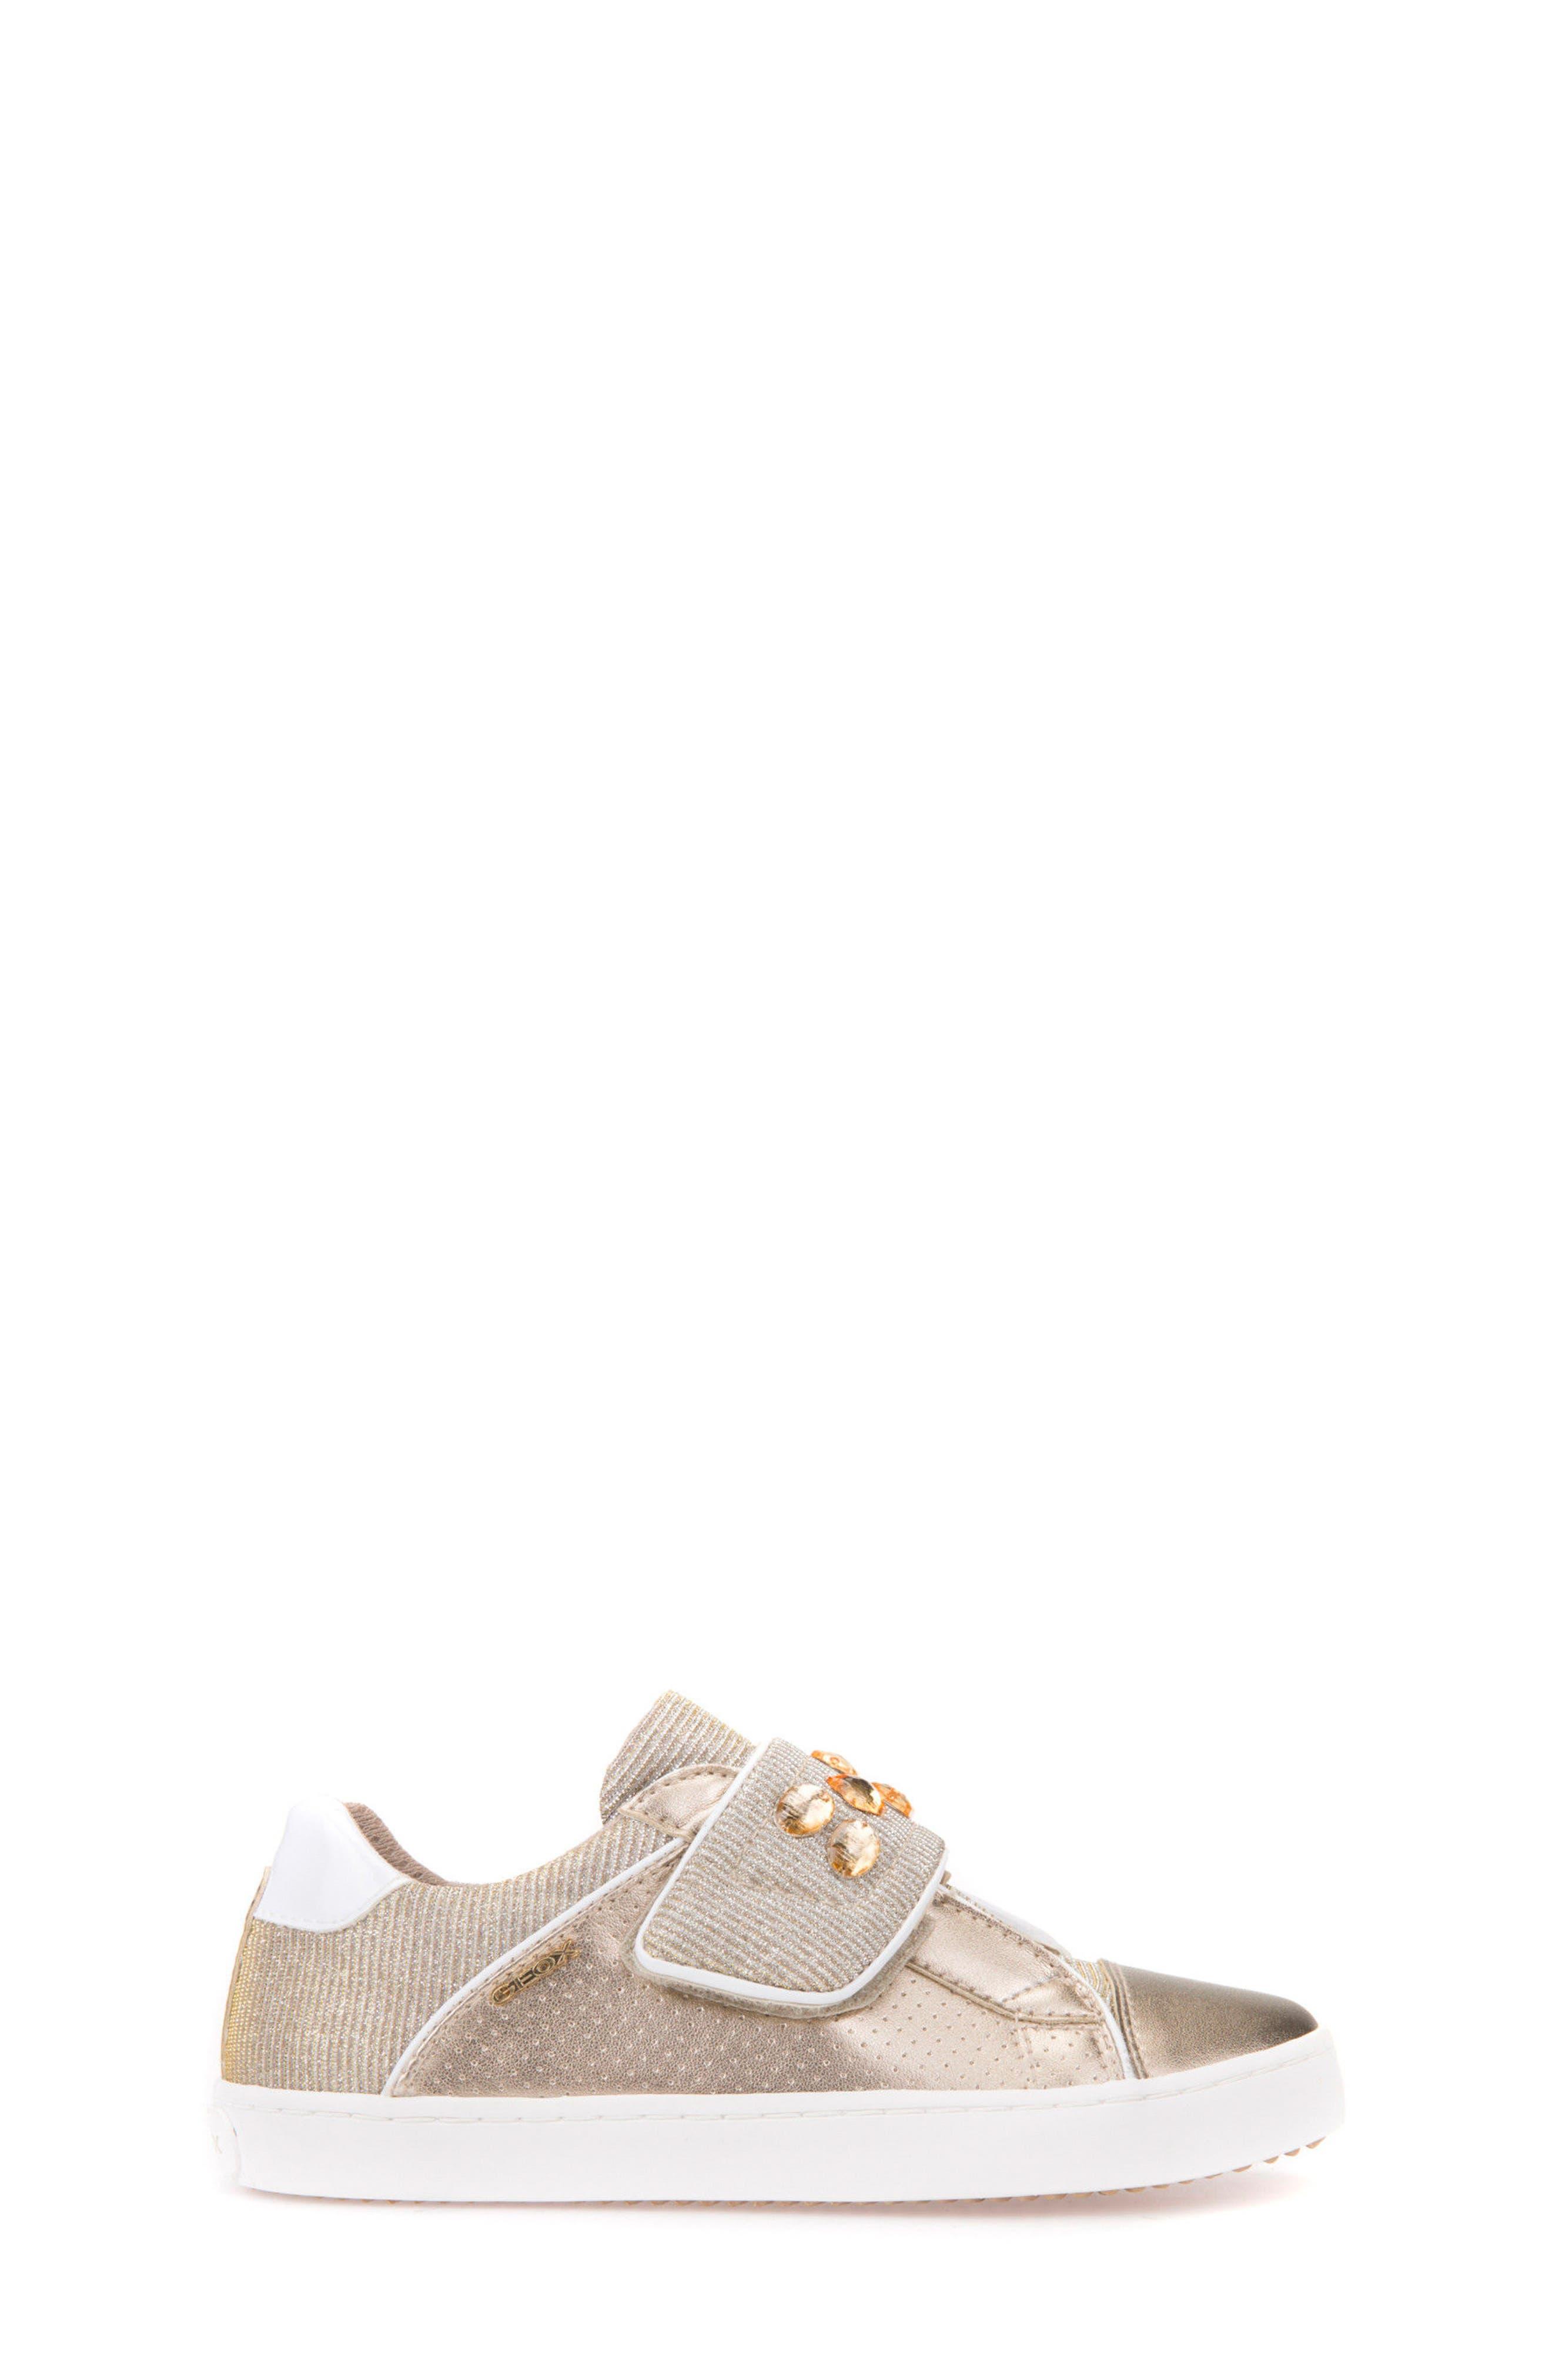 Kilwi Metallic Embellished Sneaker,                             Alternate thumbnail 3, color,                             GOLD